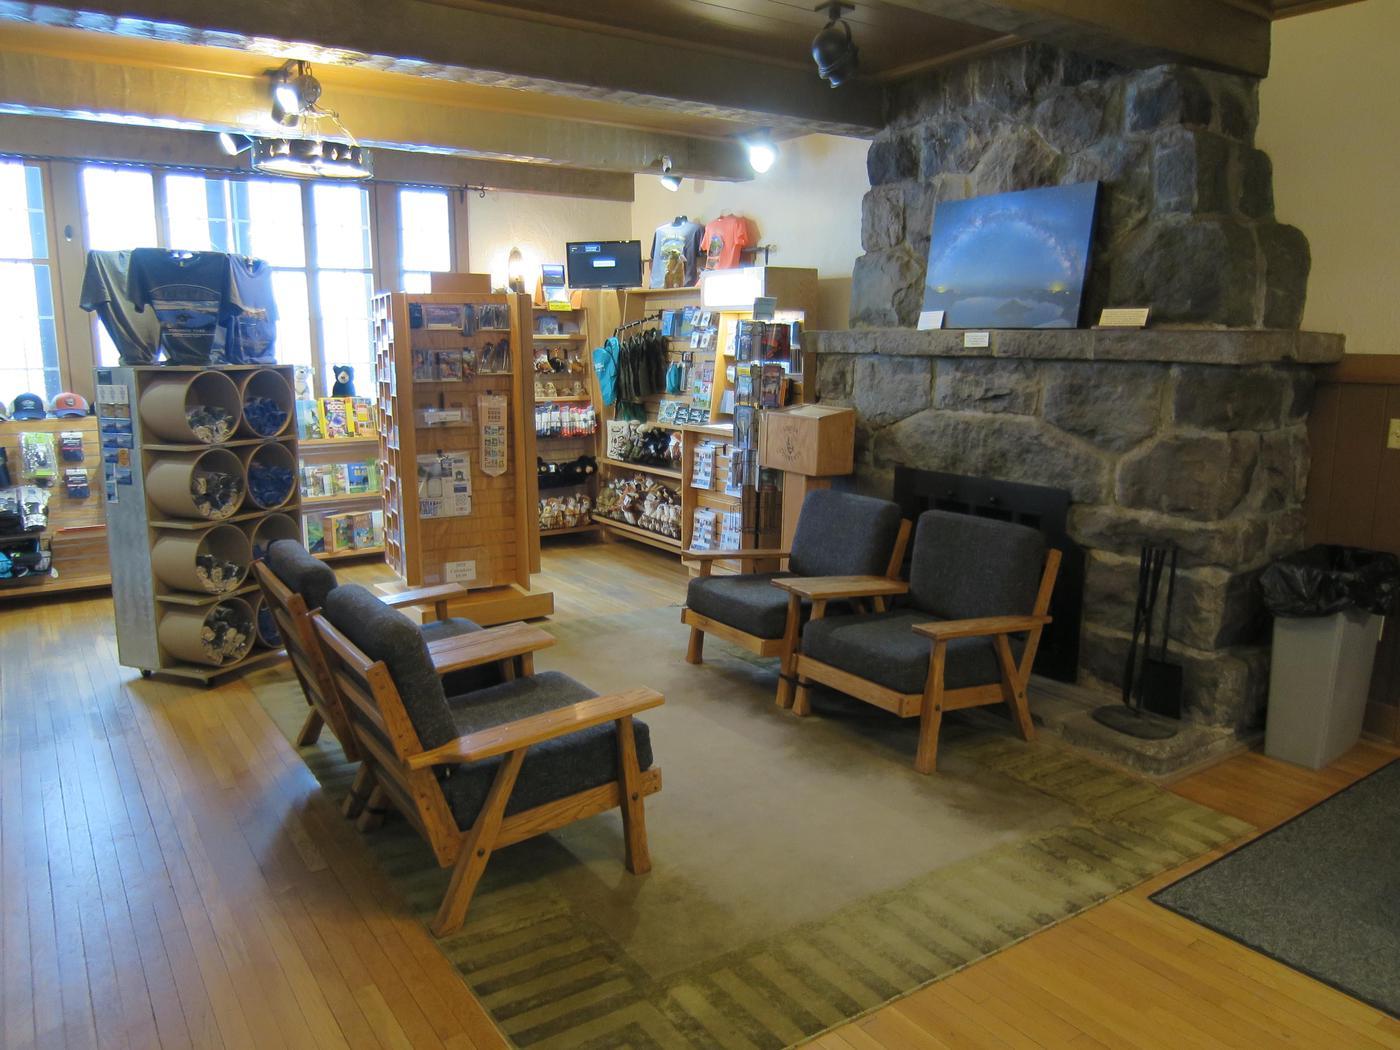 Steel Visitor Center and Park StoreThe visitor center and park store are located inside a historic building originally designed as ranger housing.